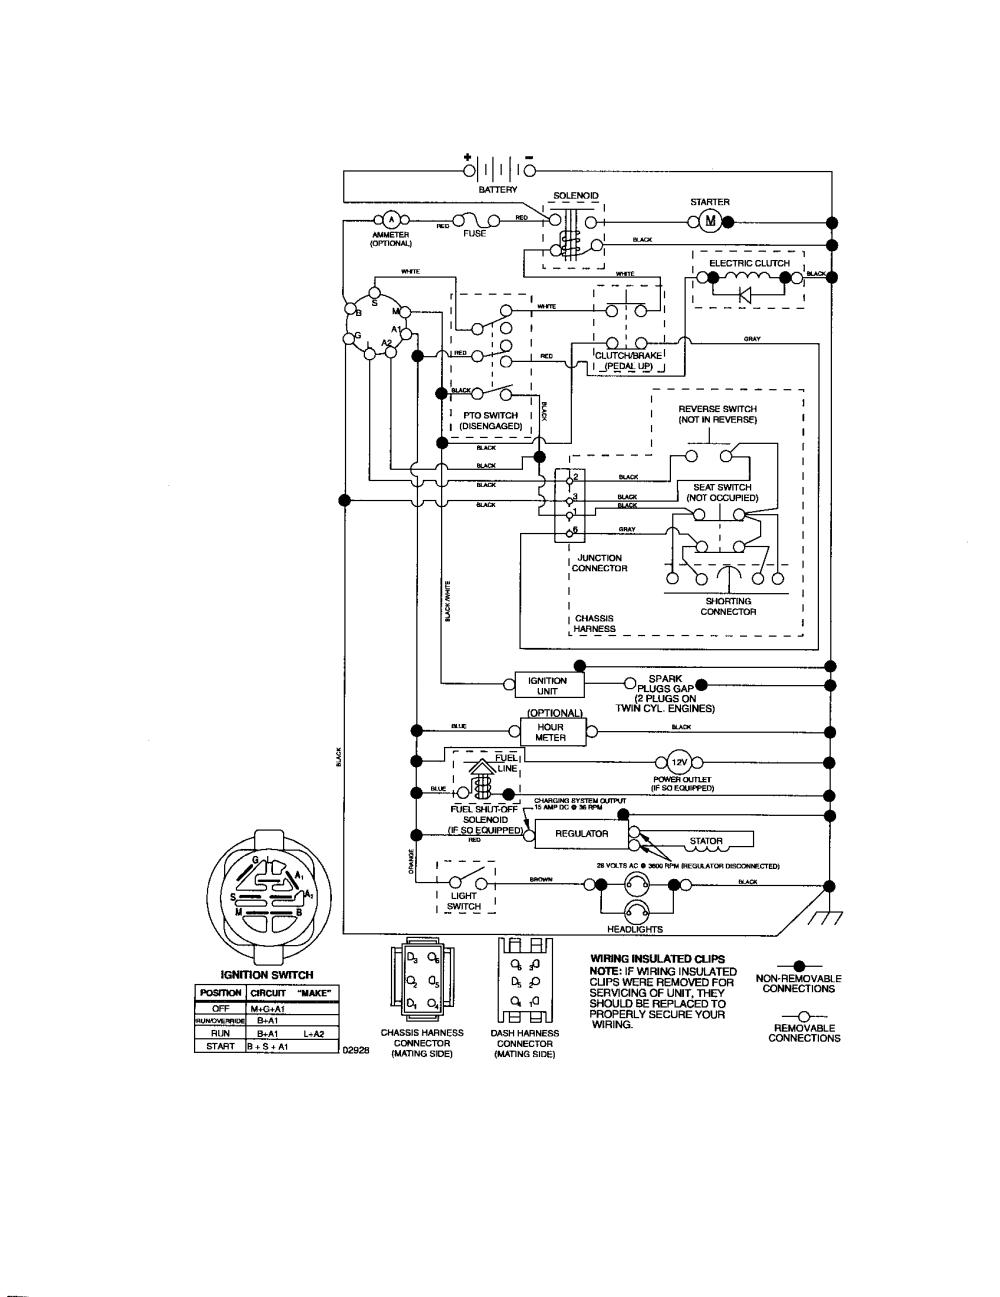 medium resolution of 15 hp kohler wiring diagram wiring librarycraftsman 15 hp kohler wiring diagram free download custom wiring